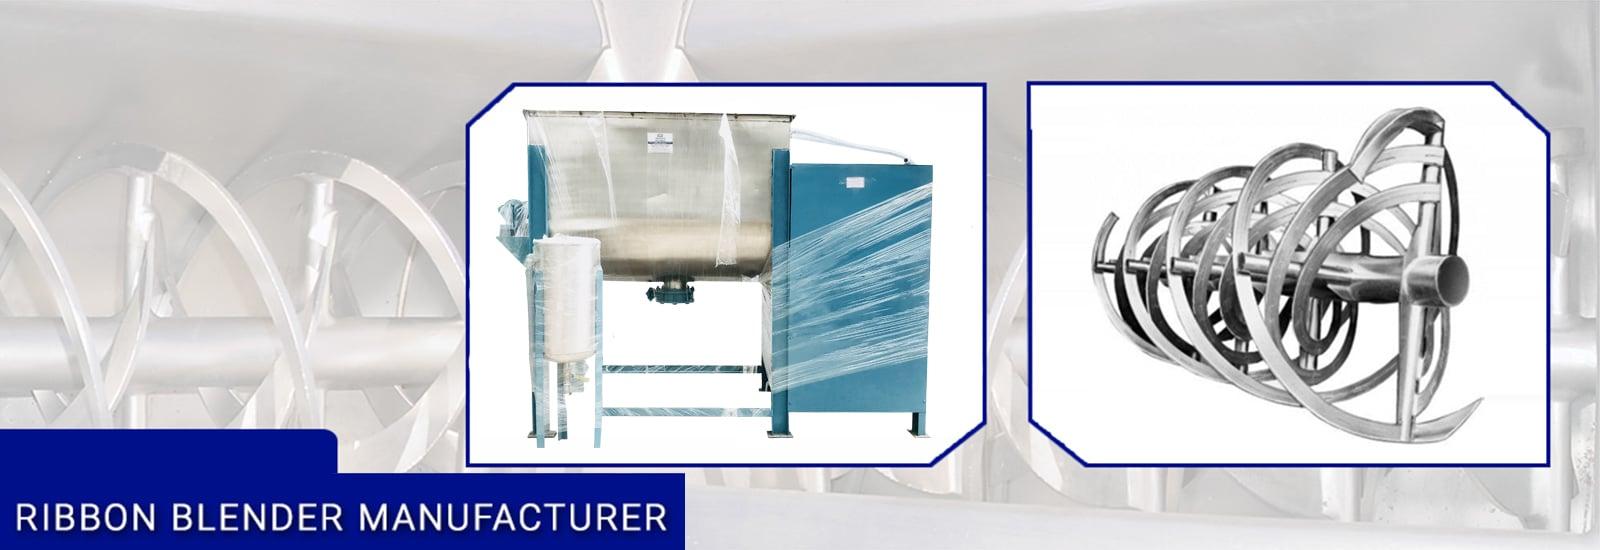 Ribbon Blender Manufacturer, Supplier and Exporter in Ahmedabad, Gujarat, India